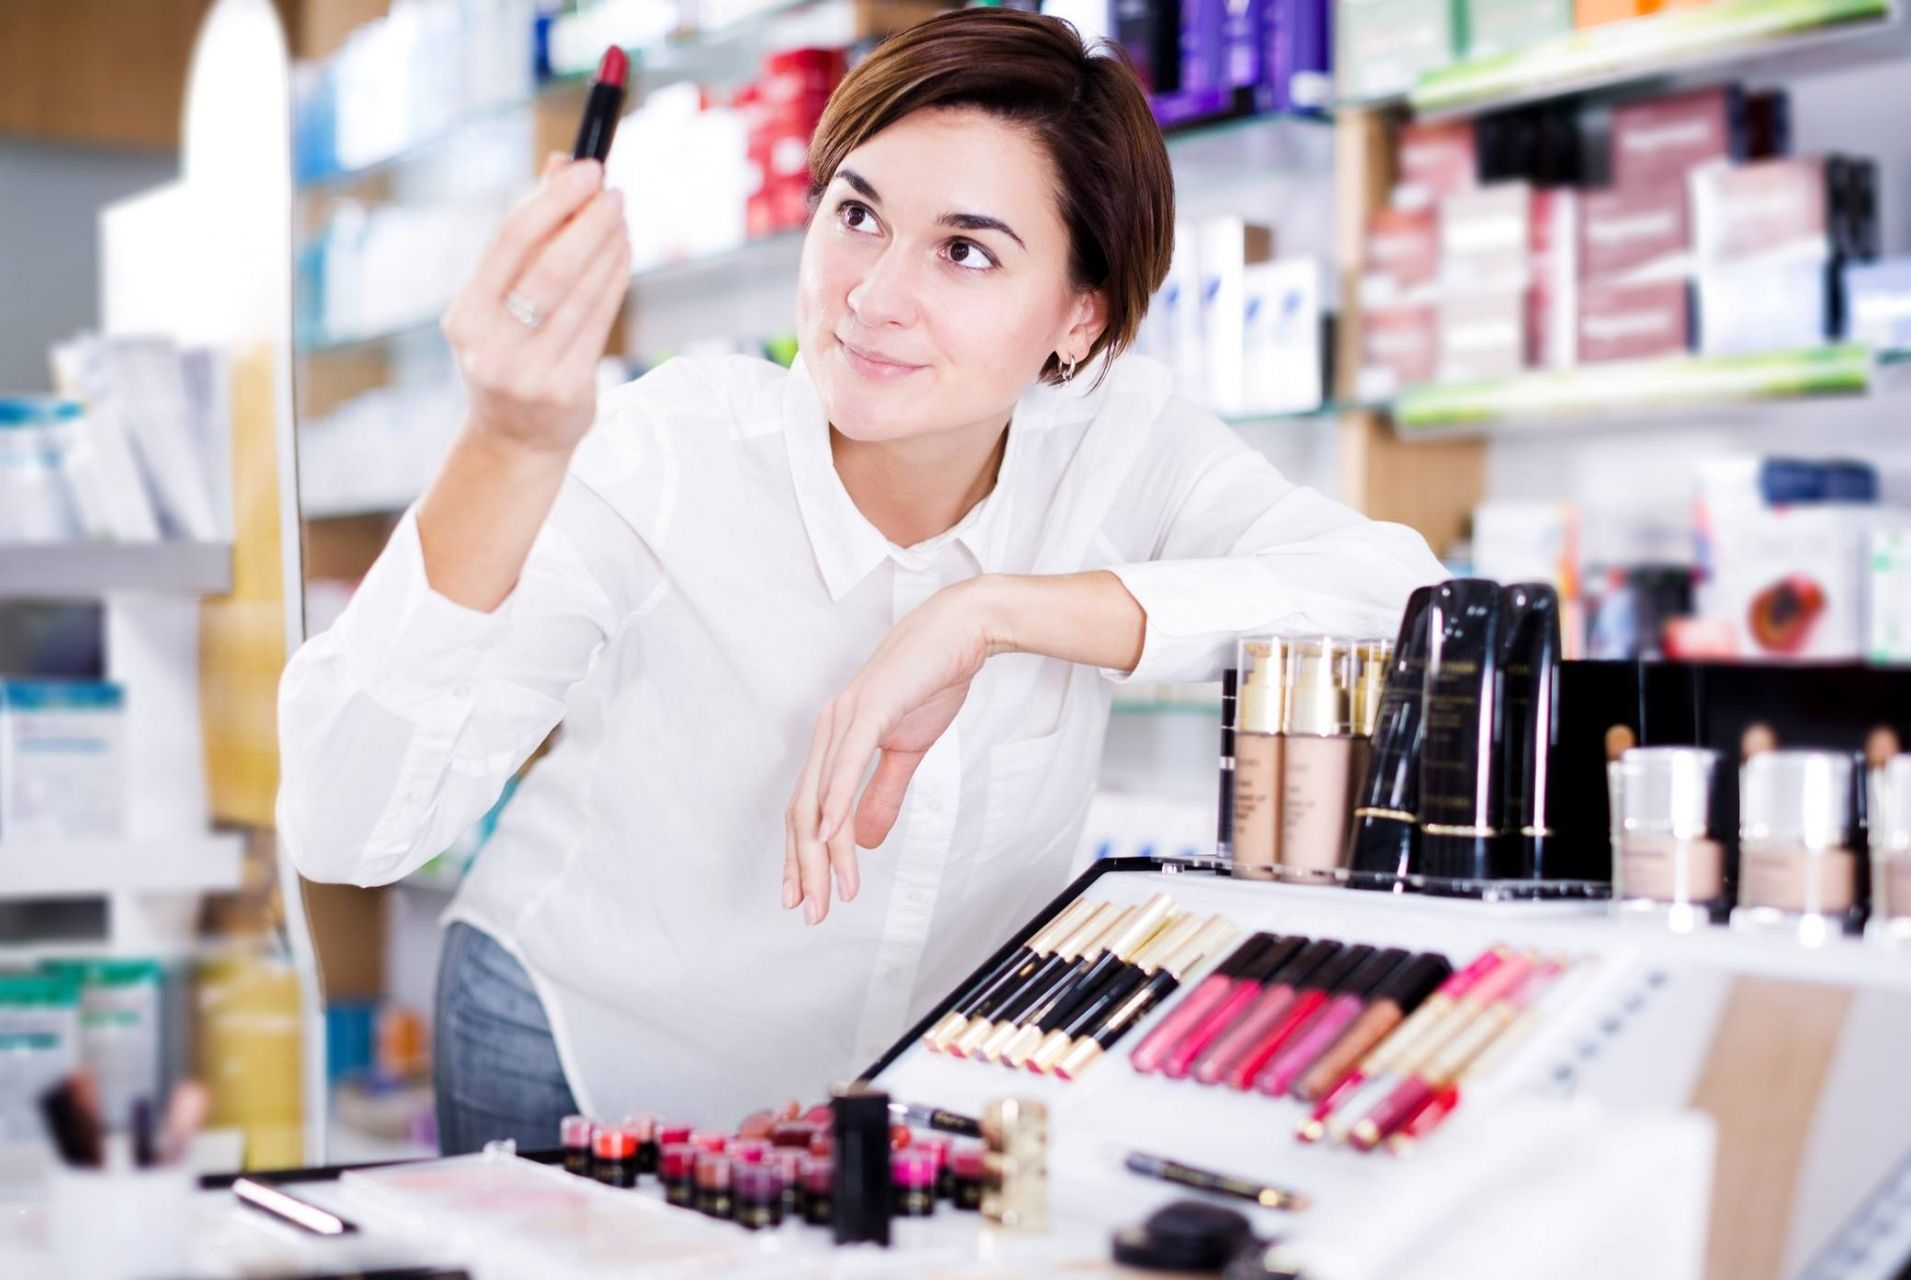 Según el informe Beauty Obsession de EAE, los españoles destinan una media de 150€ anuales en cosmética